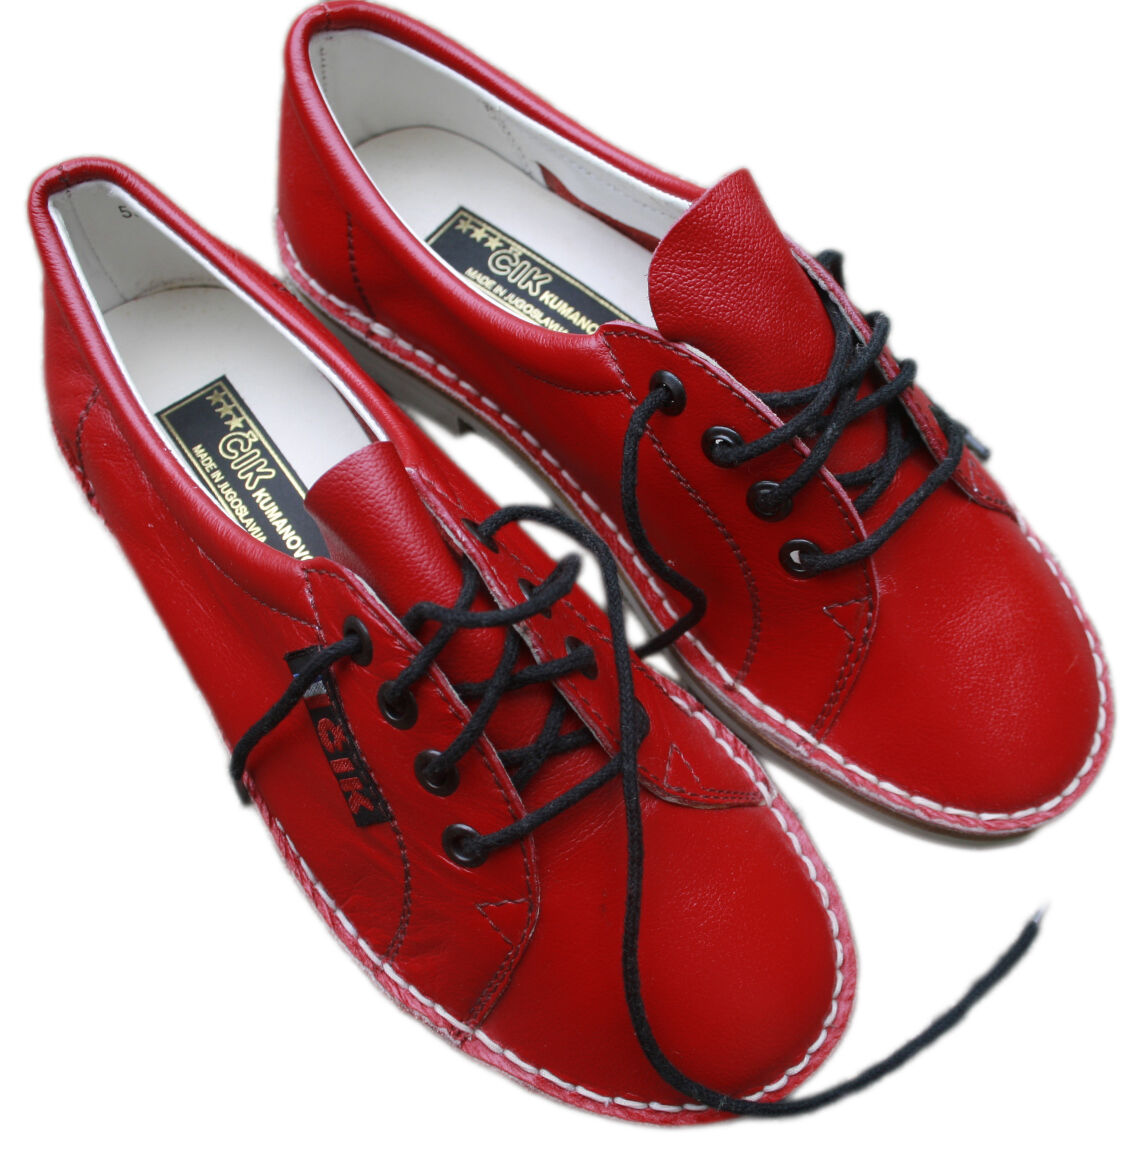 USA Espadrilles Size 7 Vintage / Retro NEW! 1980's Women's Shoes 1980's NEW!  Yugoslavia cd9f5f